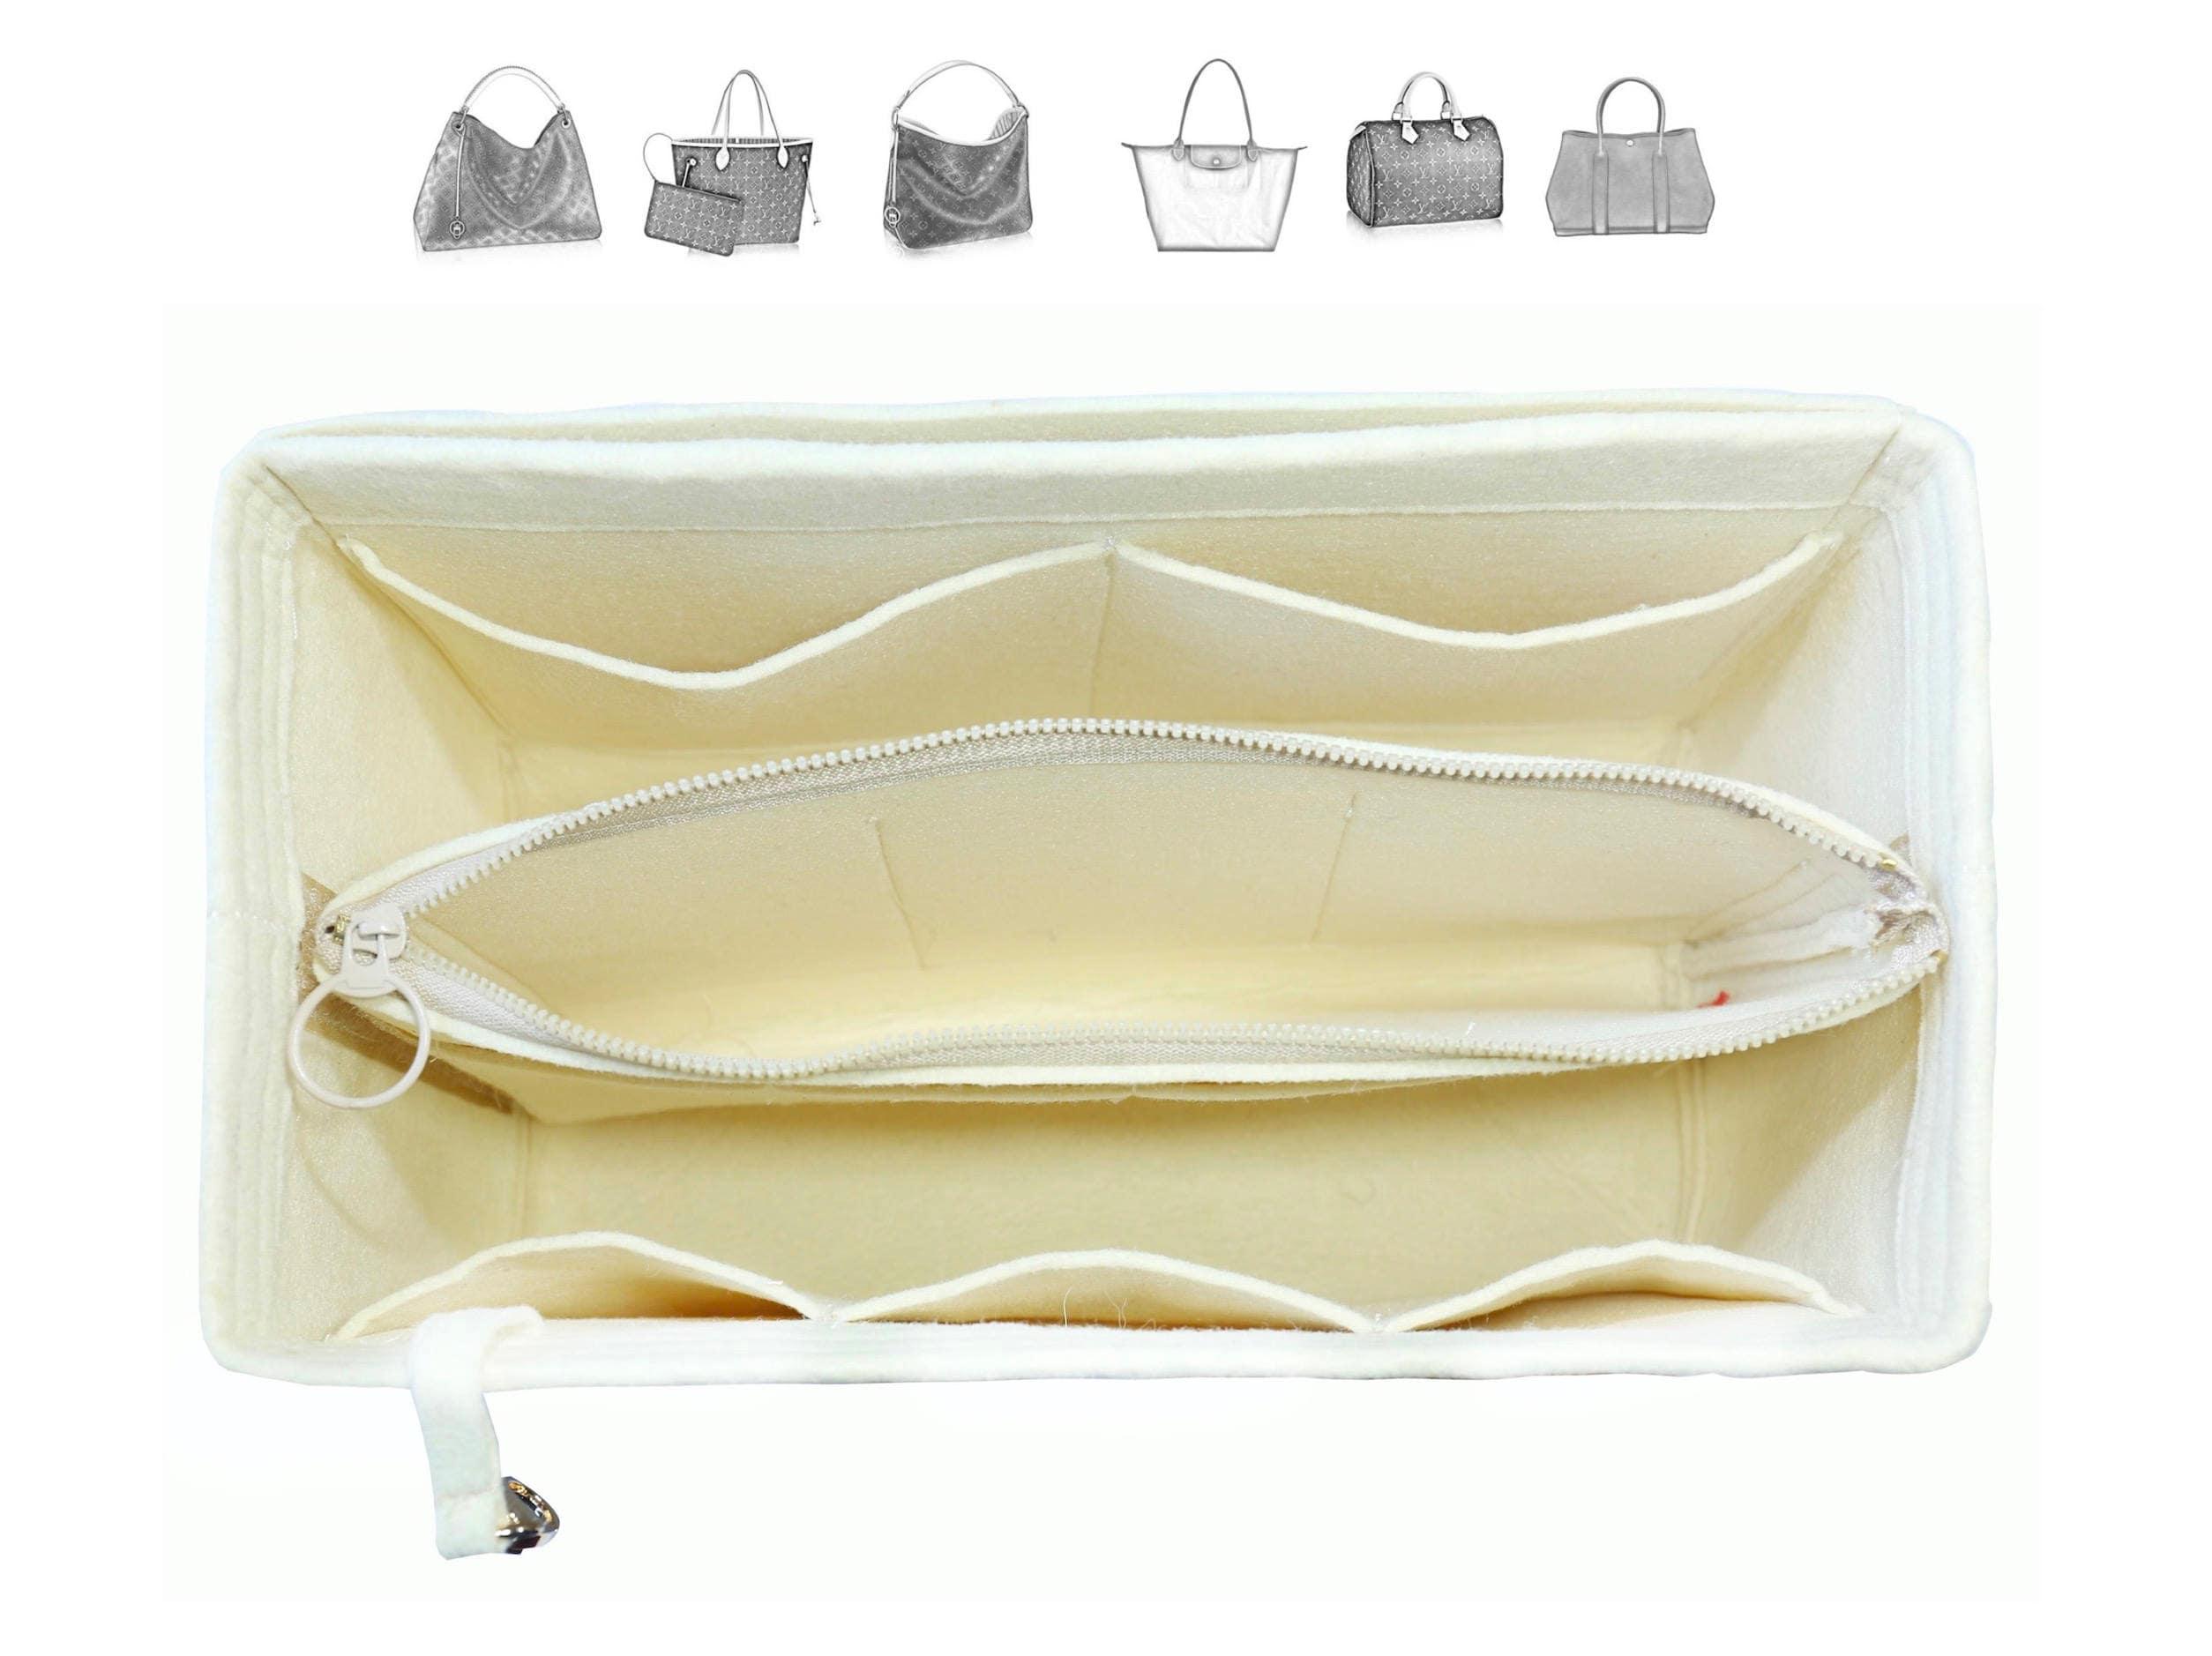 c5b08d5290 Customizable Purse Organizer (w/ Detachable Zipper Bag), Tote Felt ...